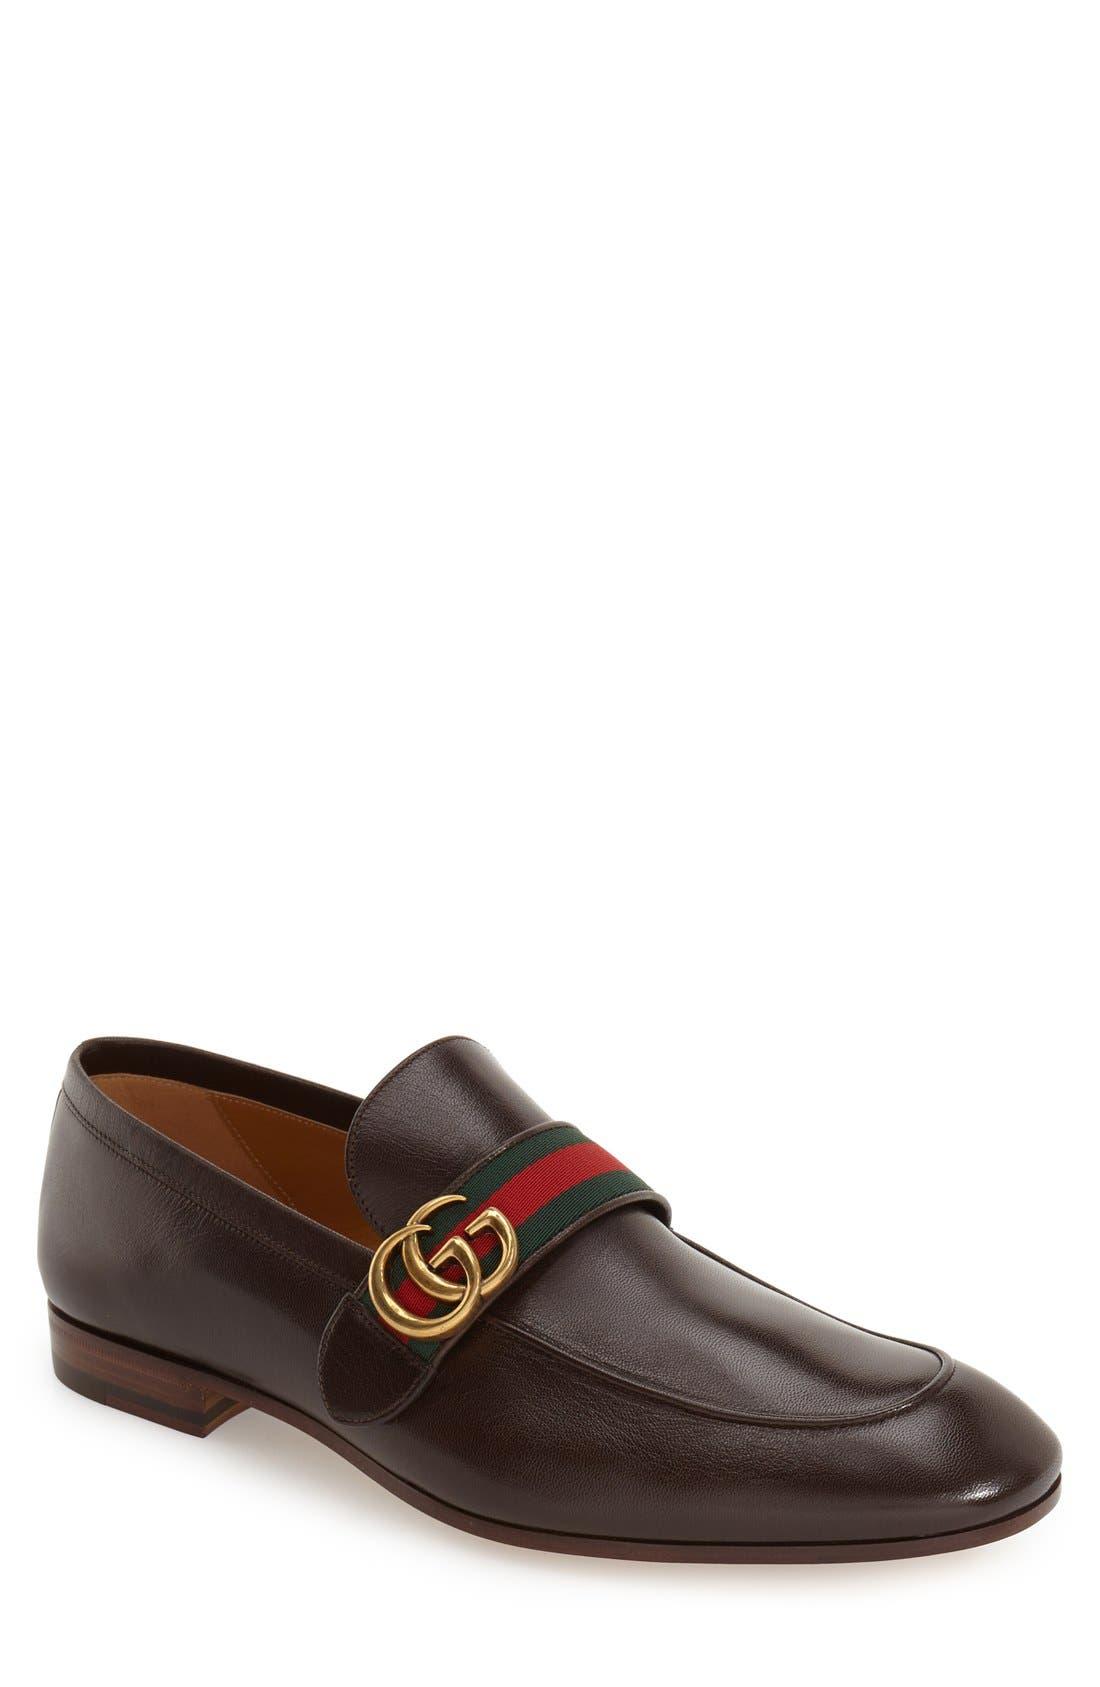 cole haan shoes tucker venetian loafers men's tommy bahamas